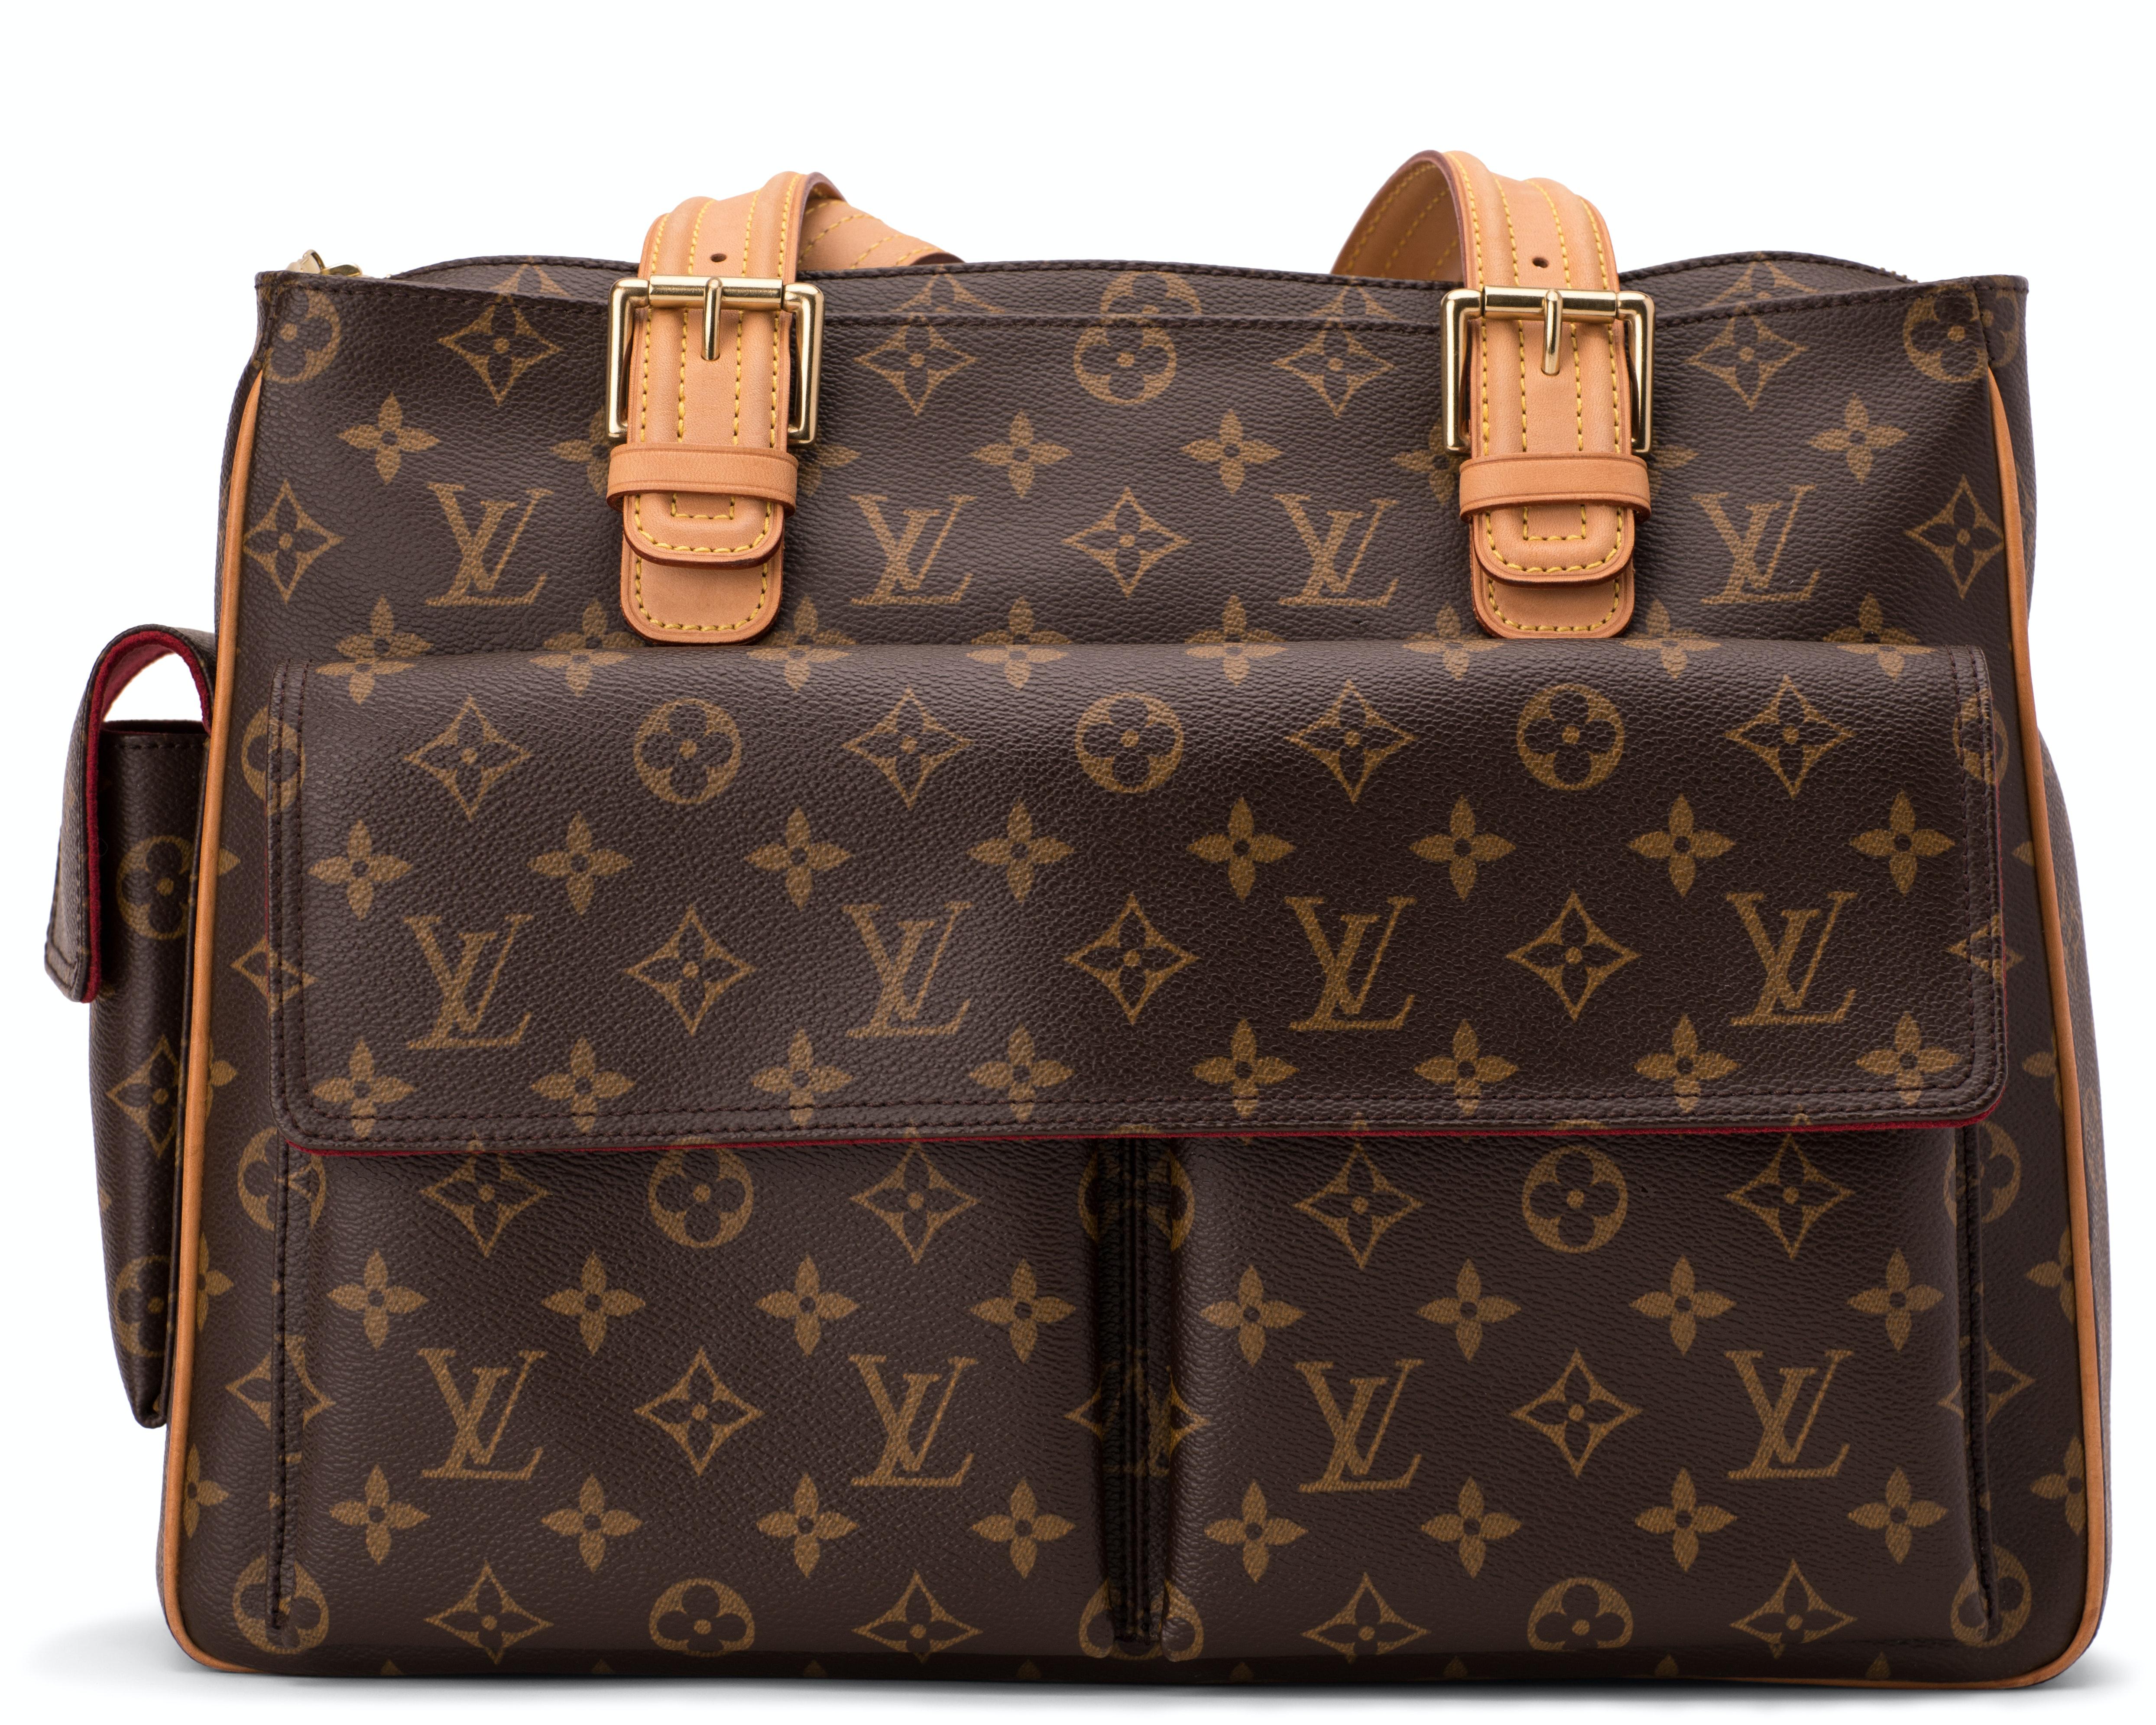 Louis Vuitton Cite Multipli Monogram Brown